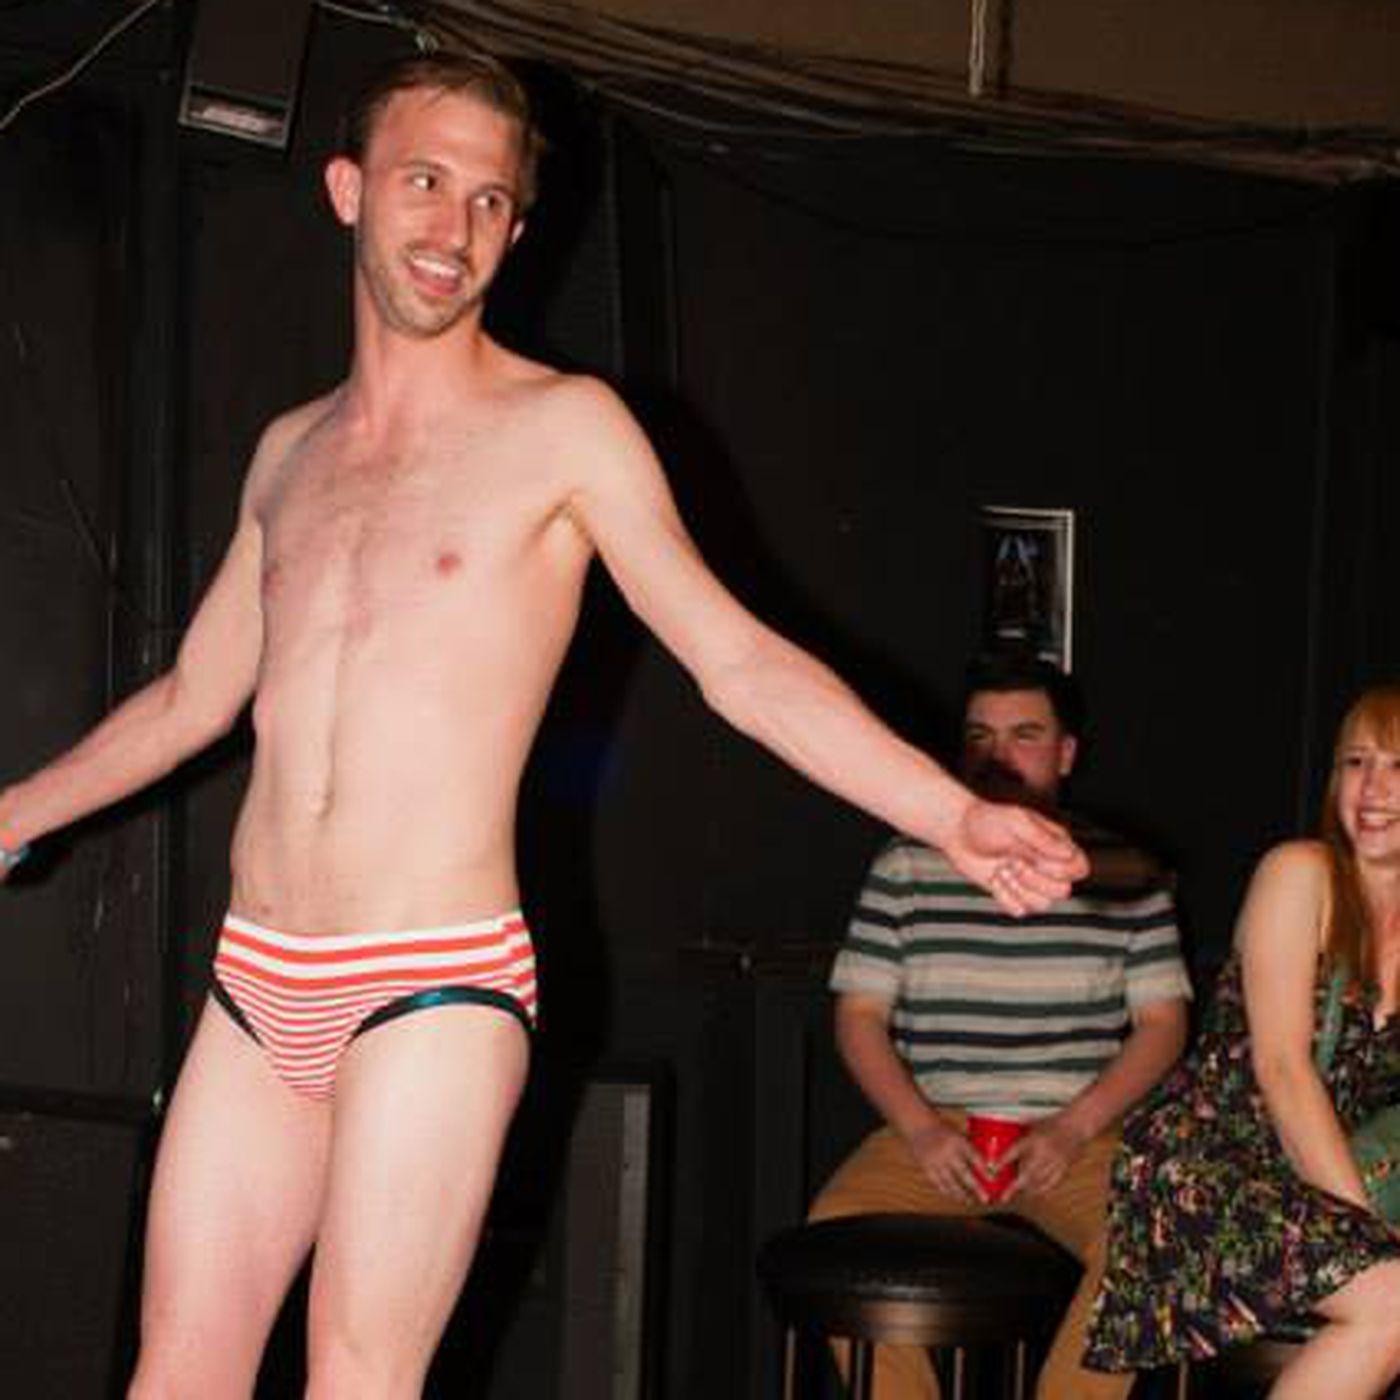 Ben masters gay plays